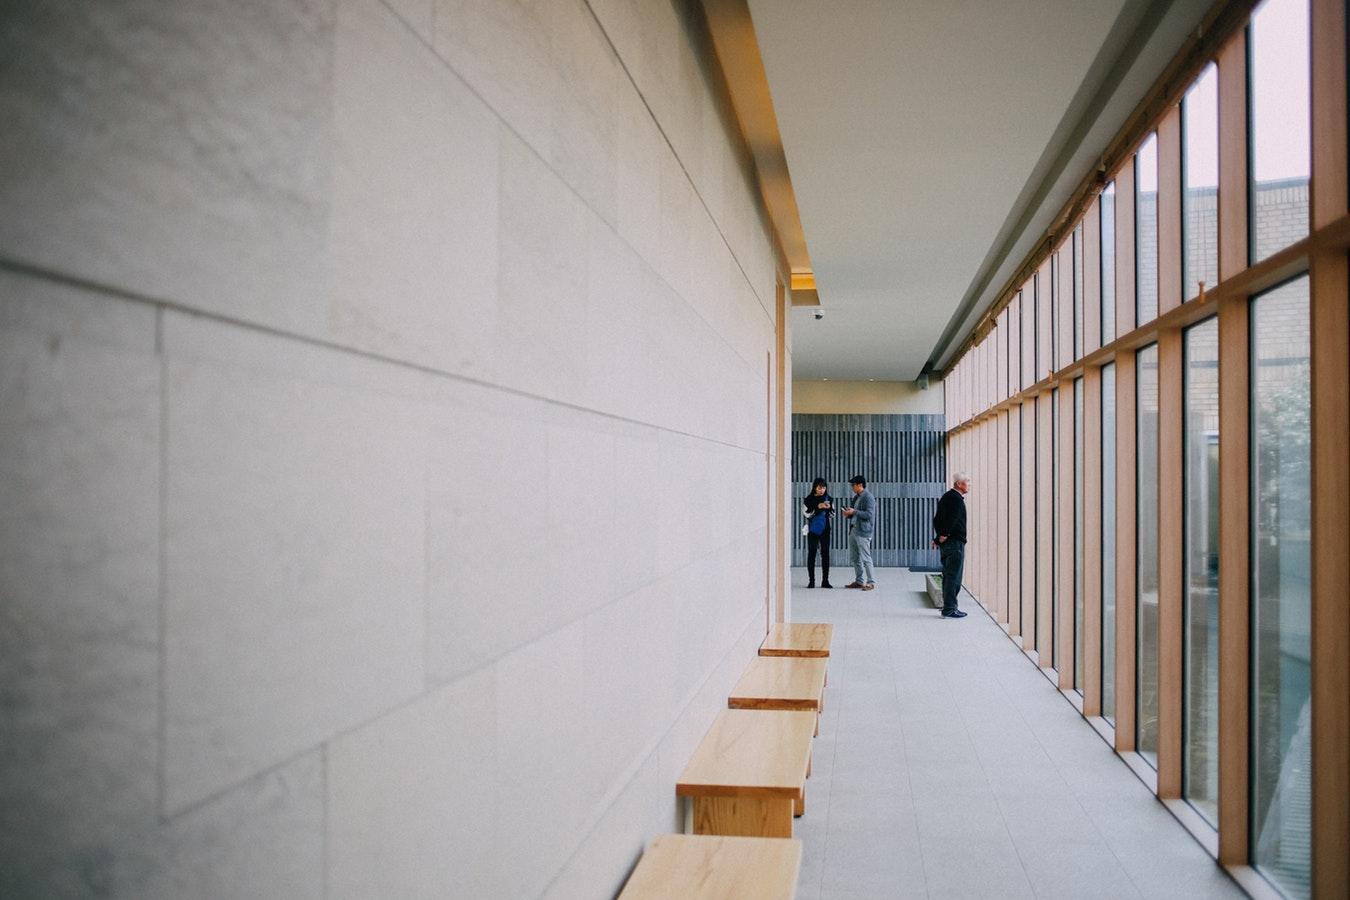 Archisoup-architect-self-build-selfbuild-advise-architecture-modern-client-find-riba-modern.jpg